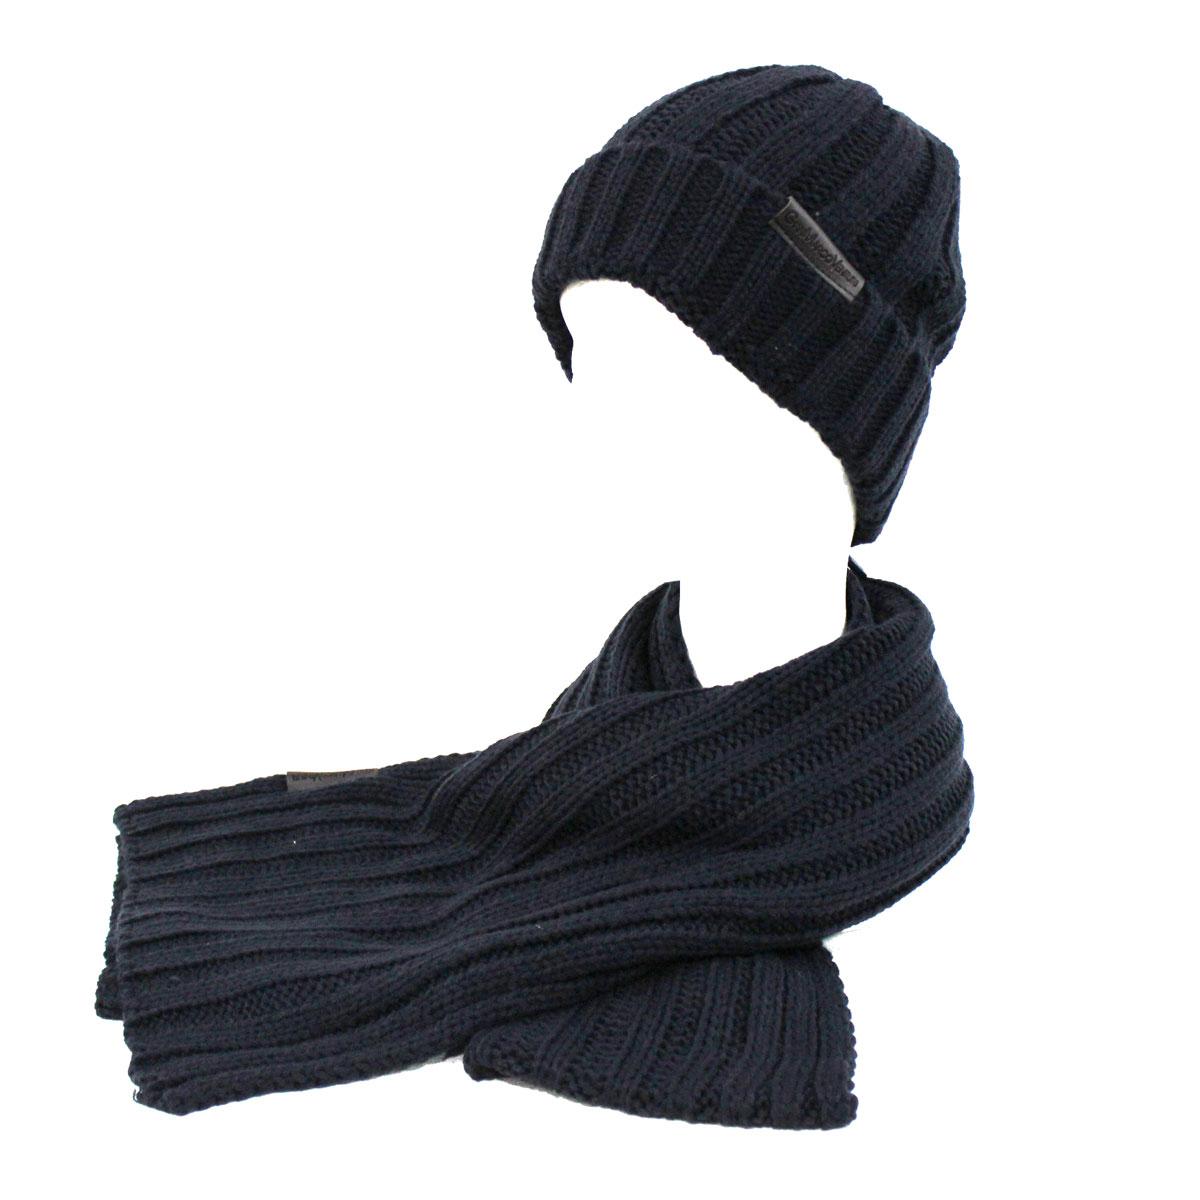 Set sciarpa e cappello uomo 100% ACRILICO in box GIAN MARCO VENTURI 71778  navy e8199db0a79d